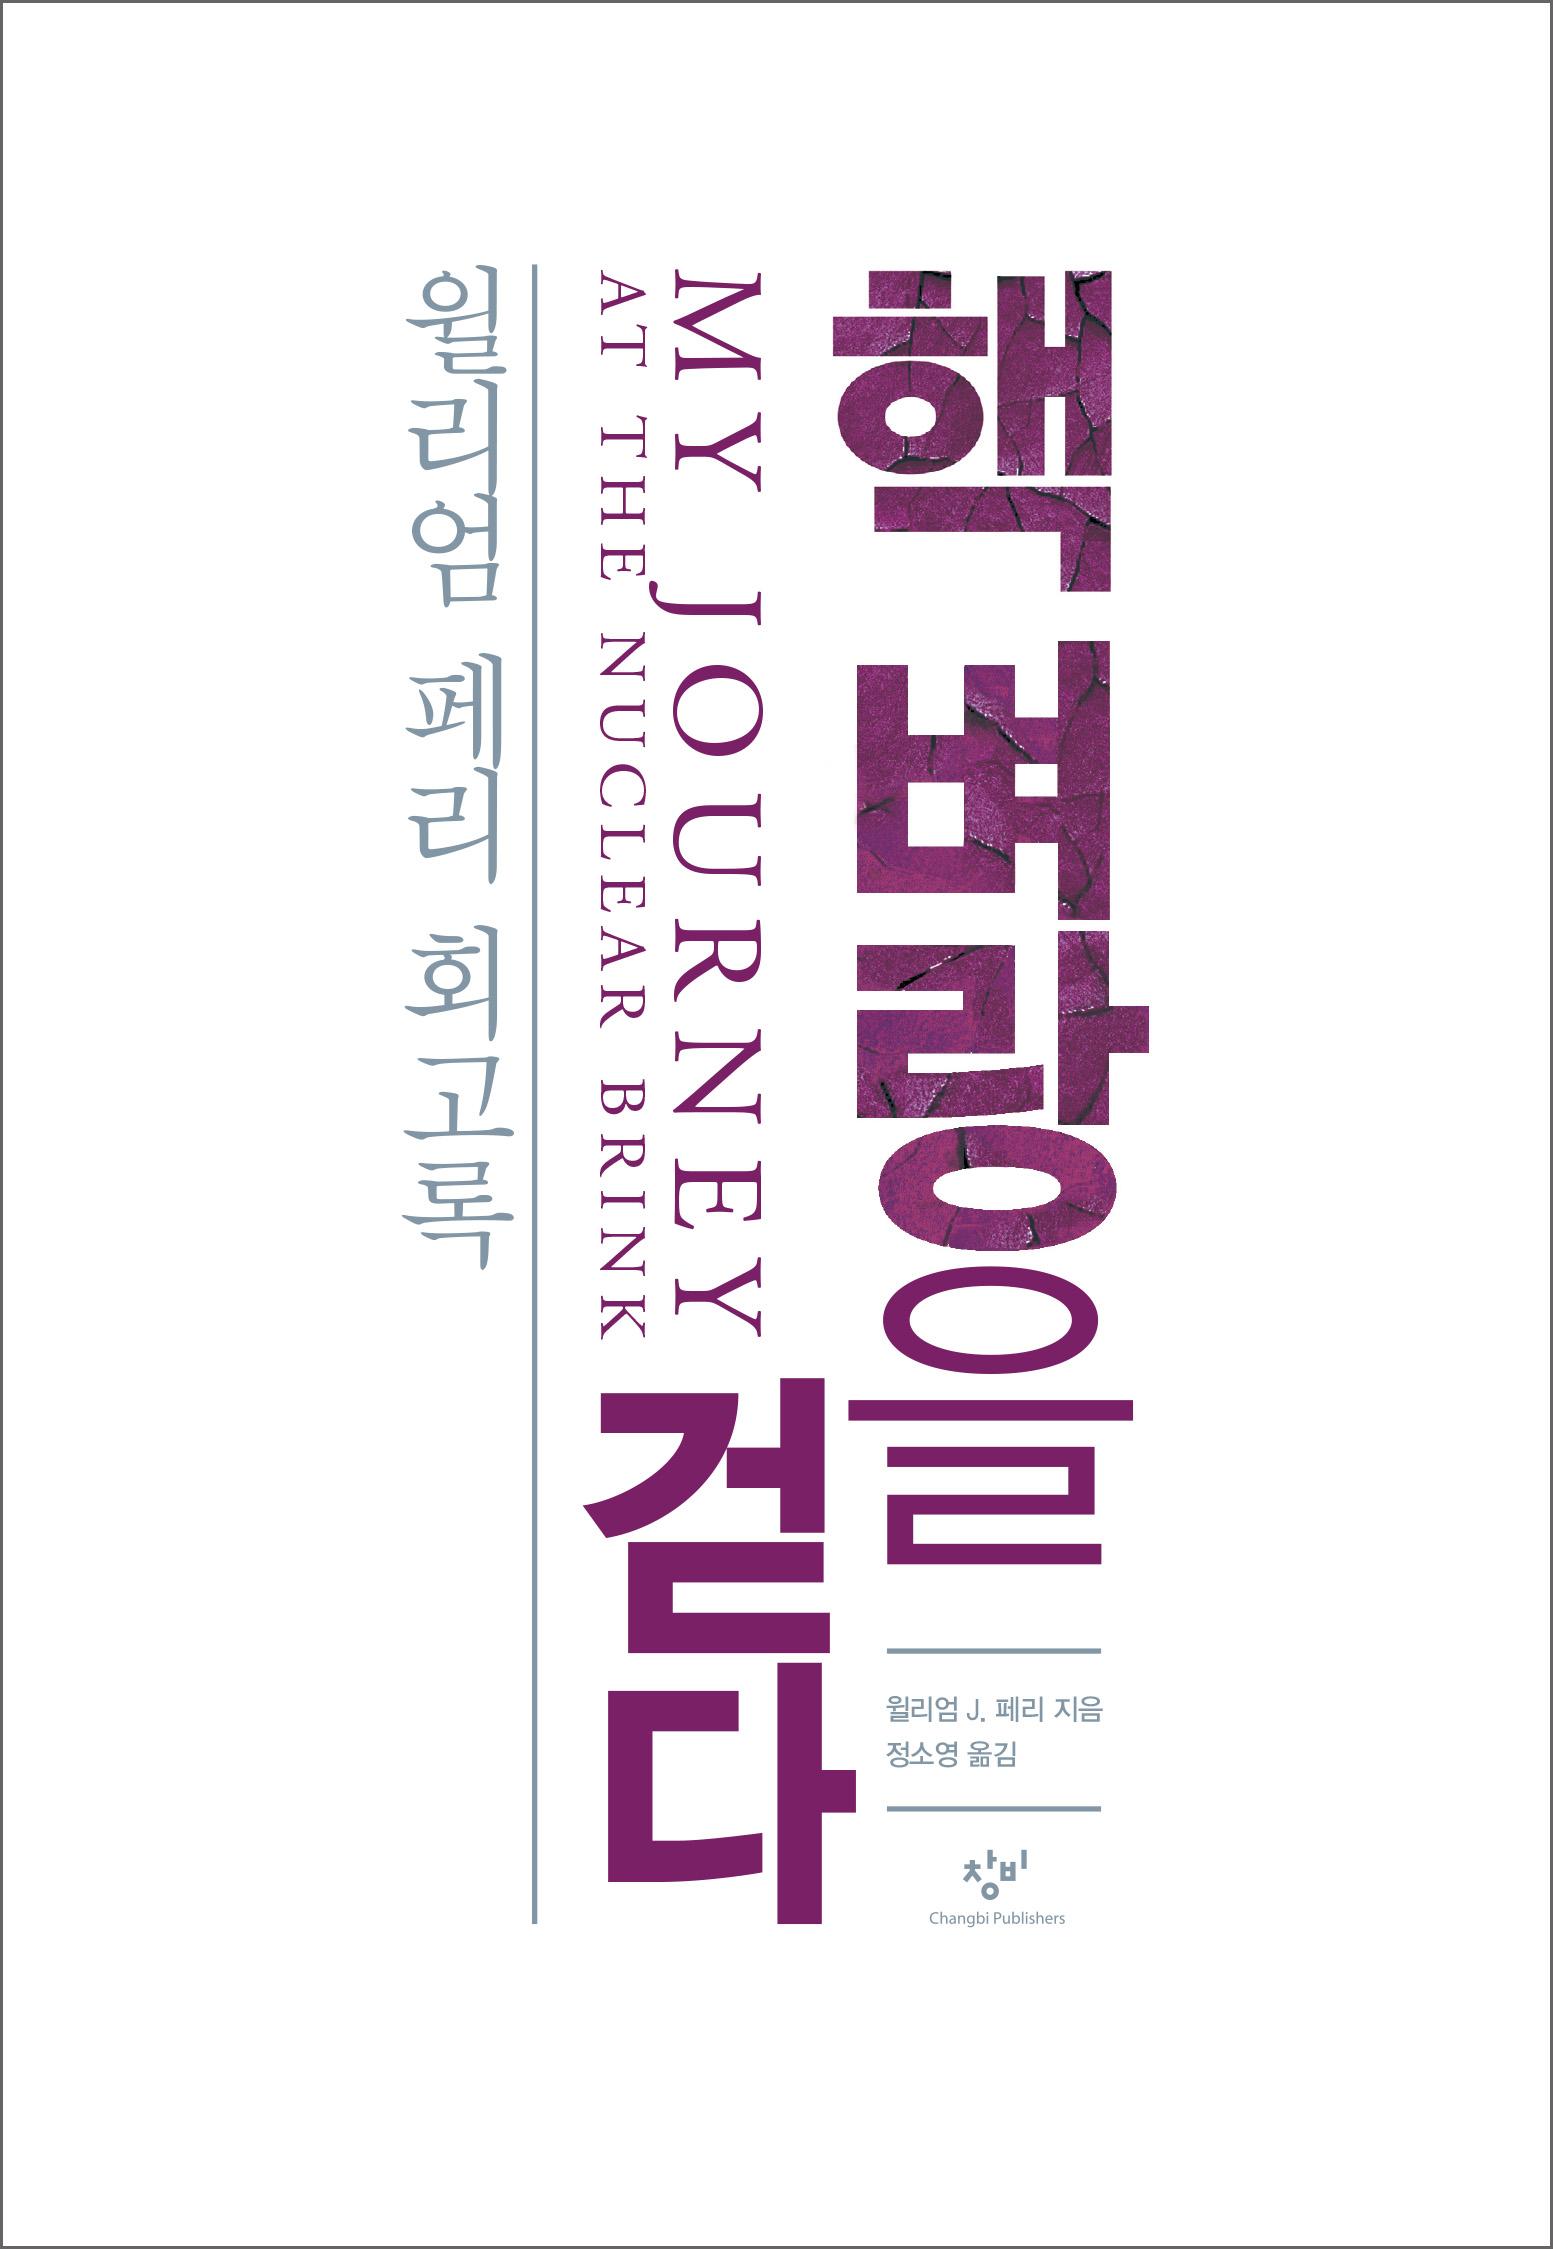 Korean Book cover01.jpg